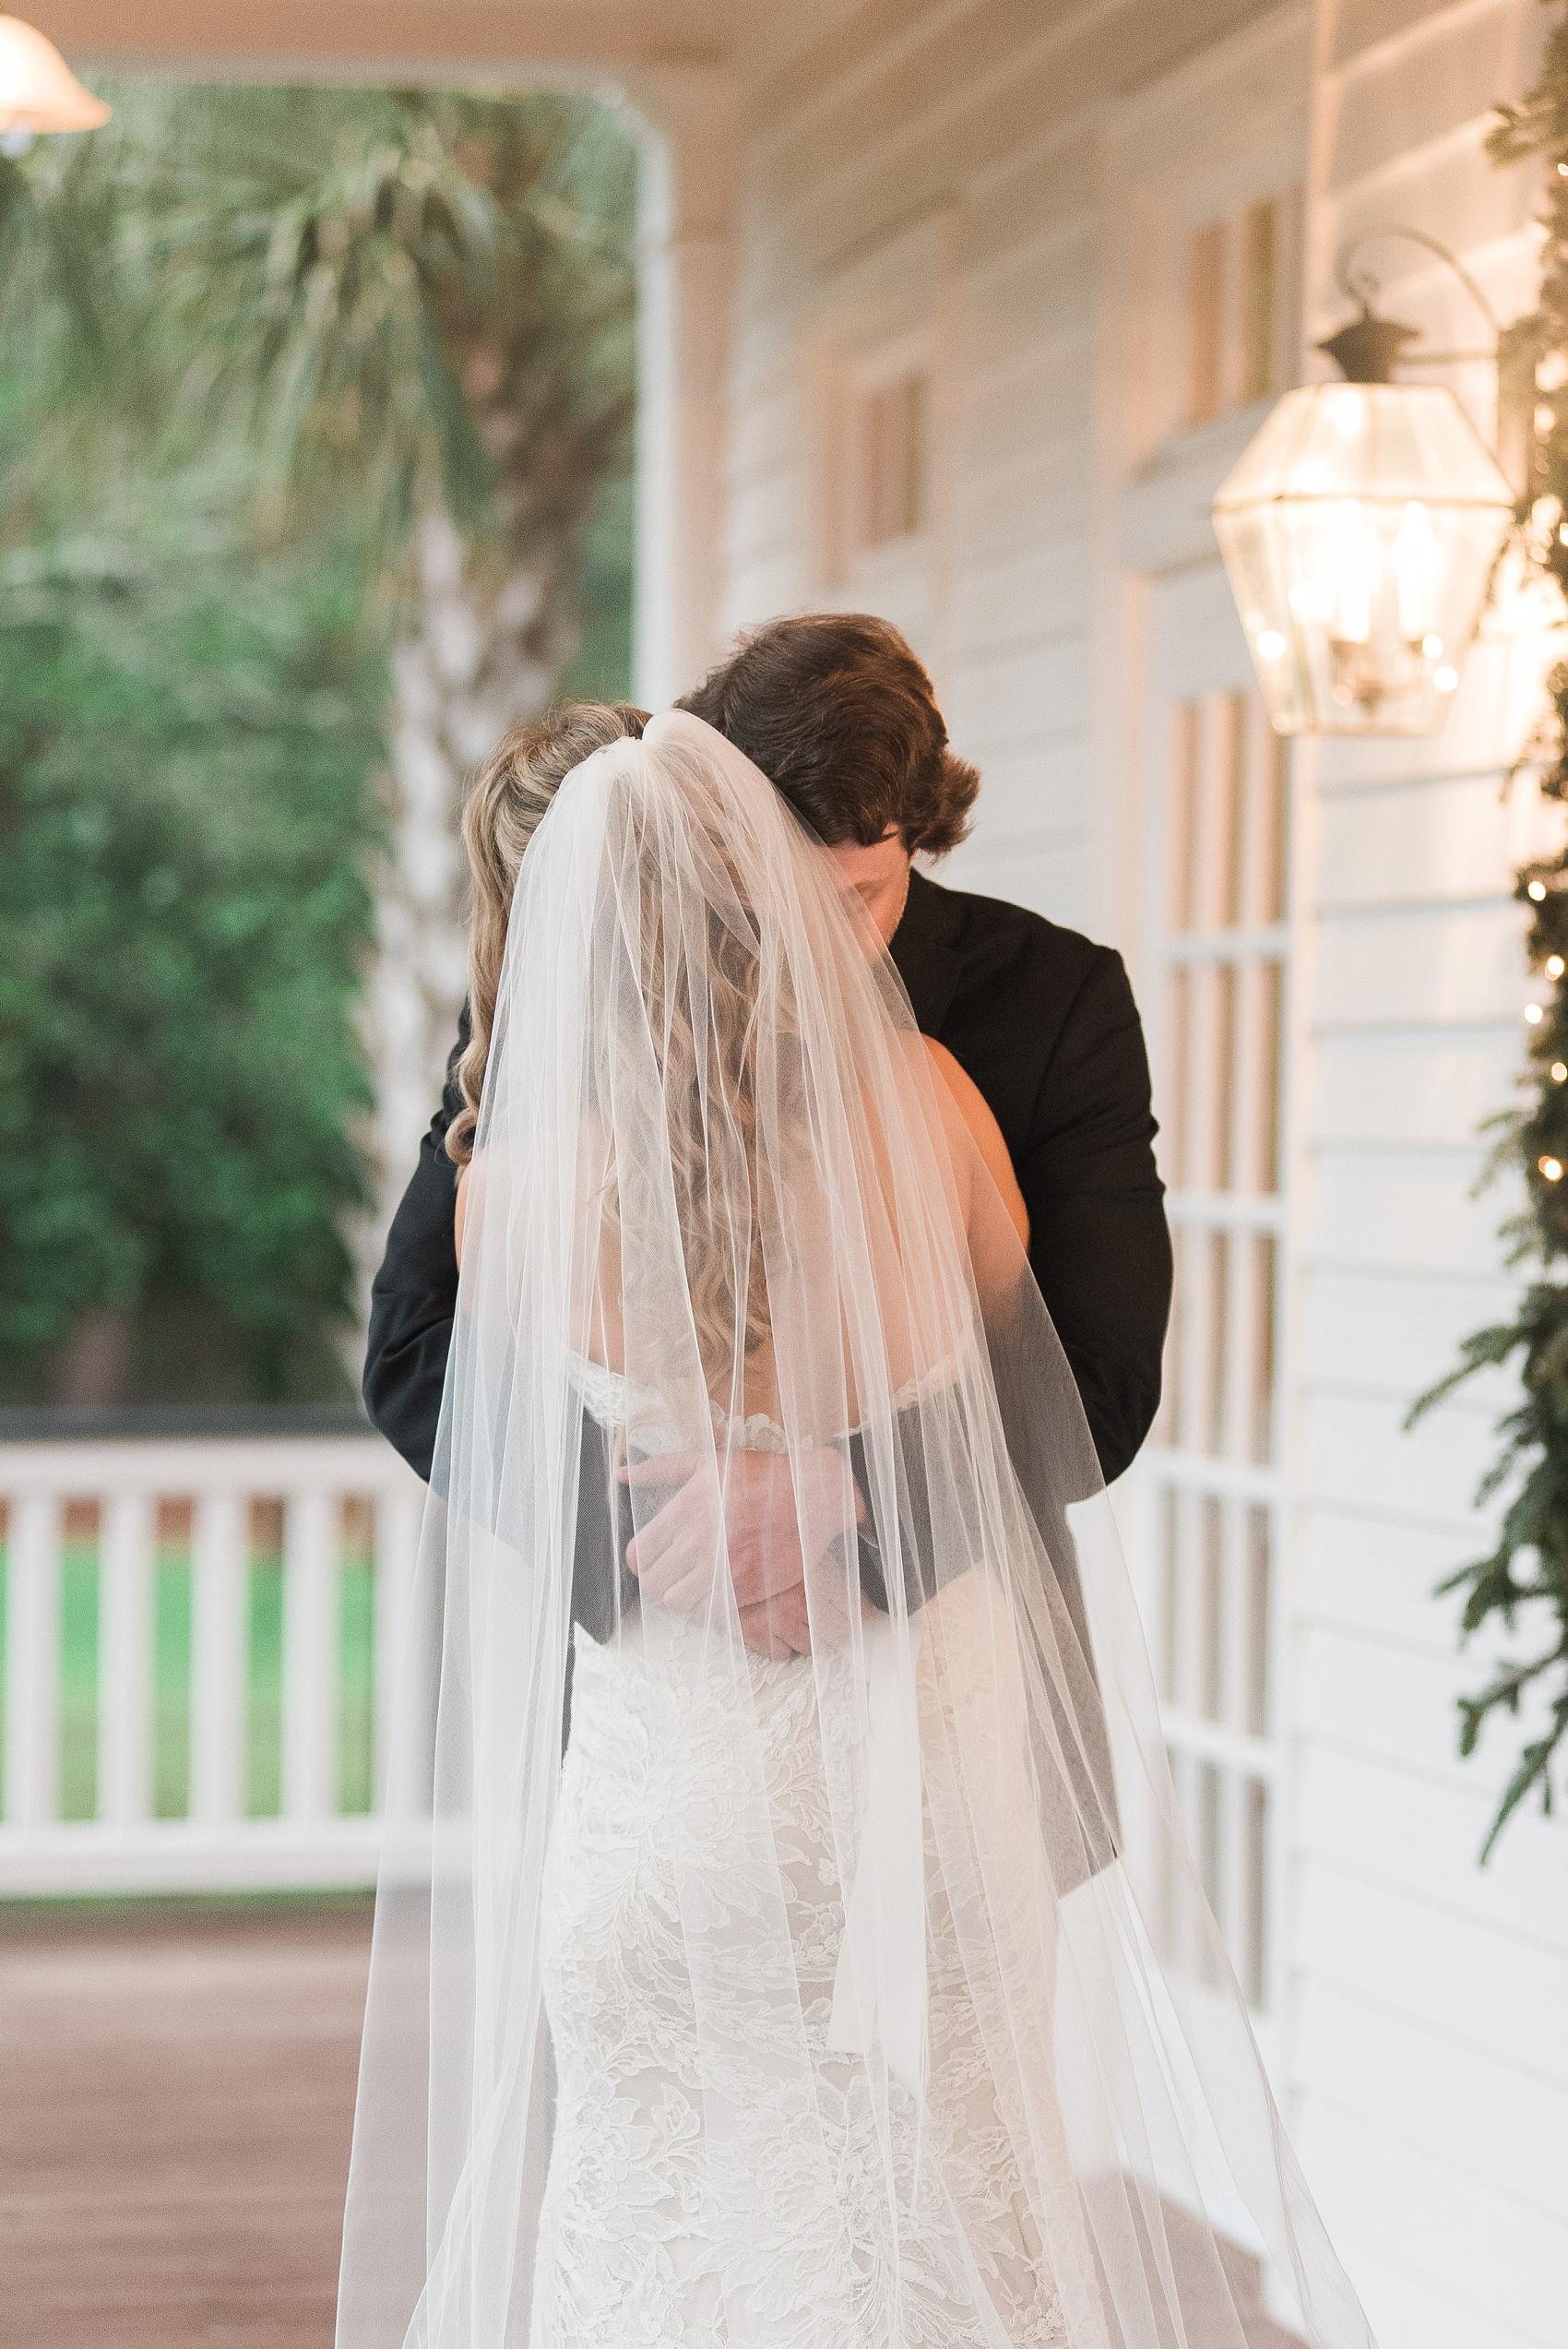 South_carolina_wedding_photographer_0150.jpg